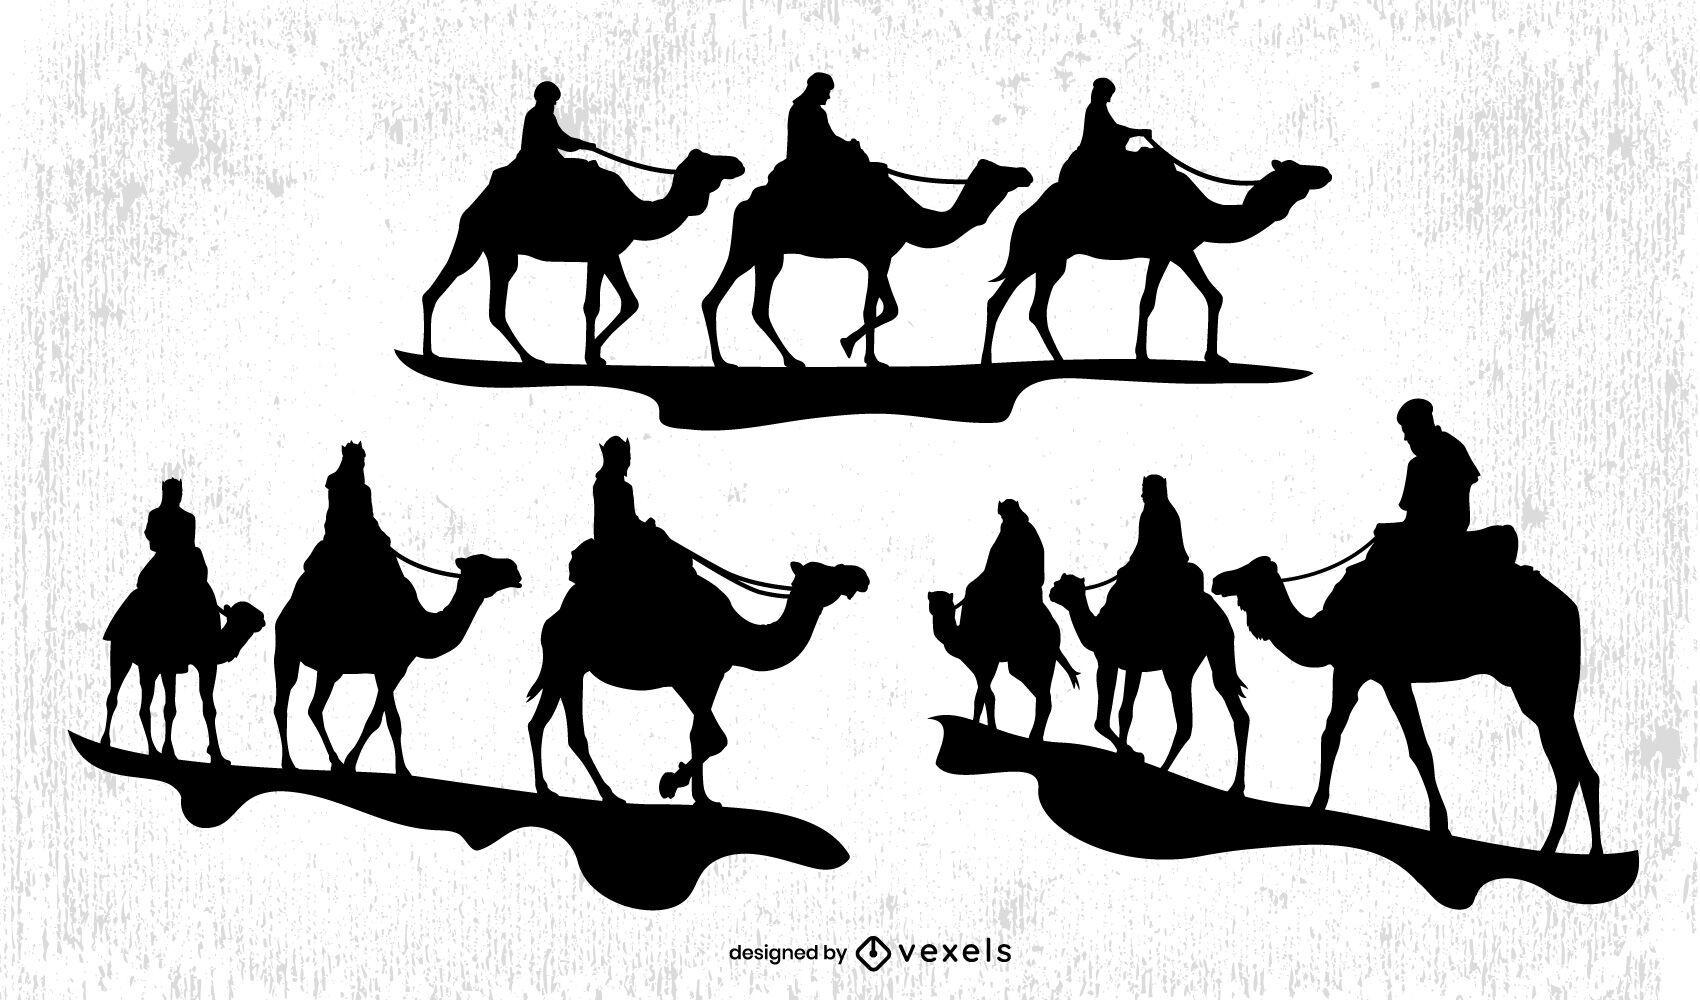 Conjunto de silueta de hombres sabios en camellos